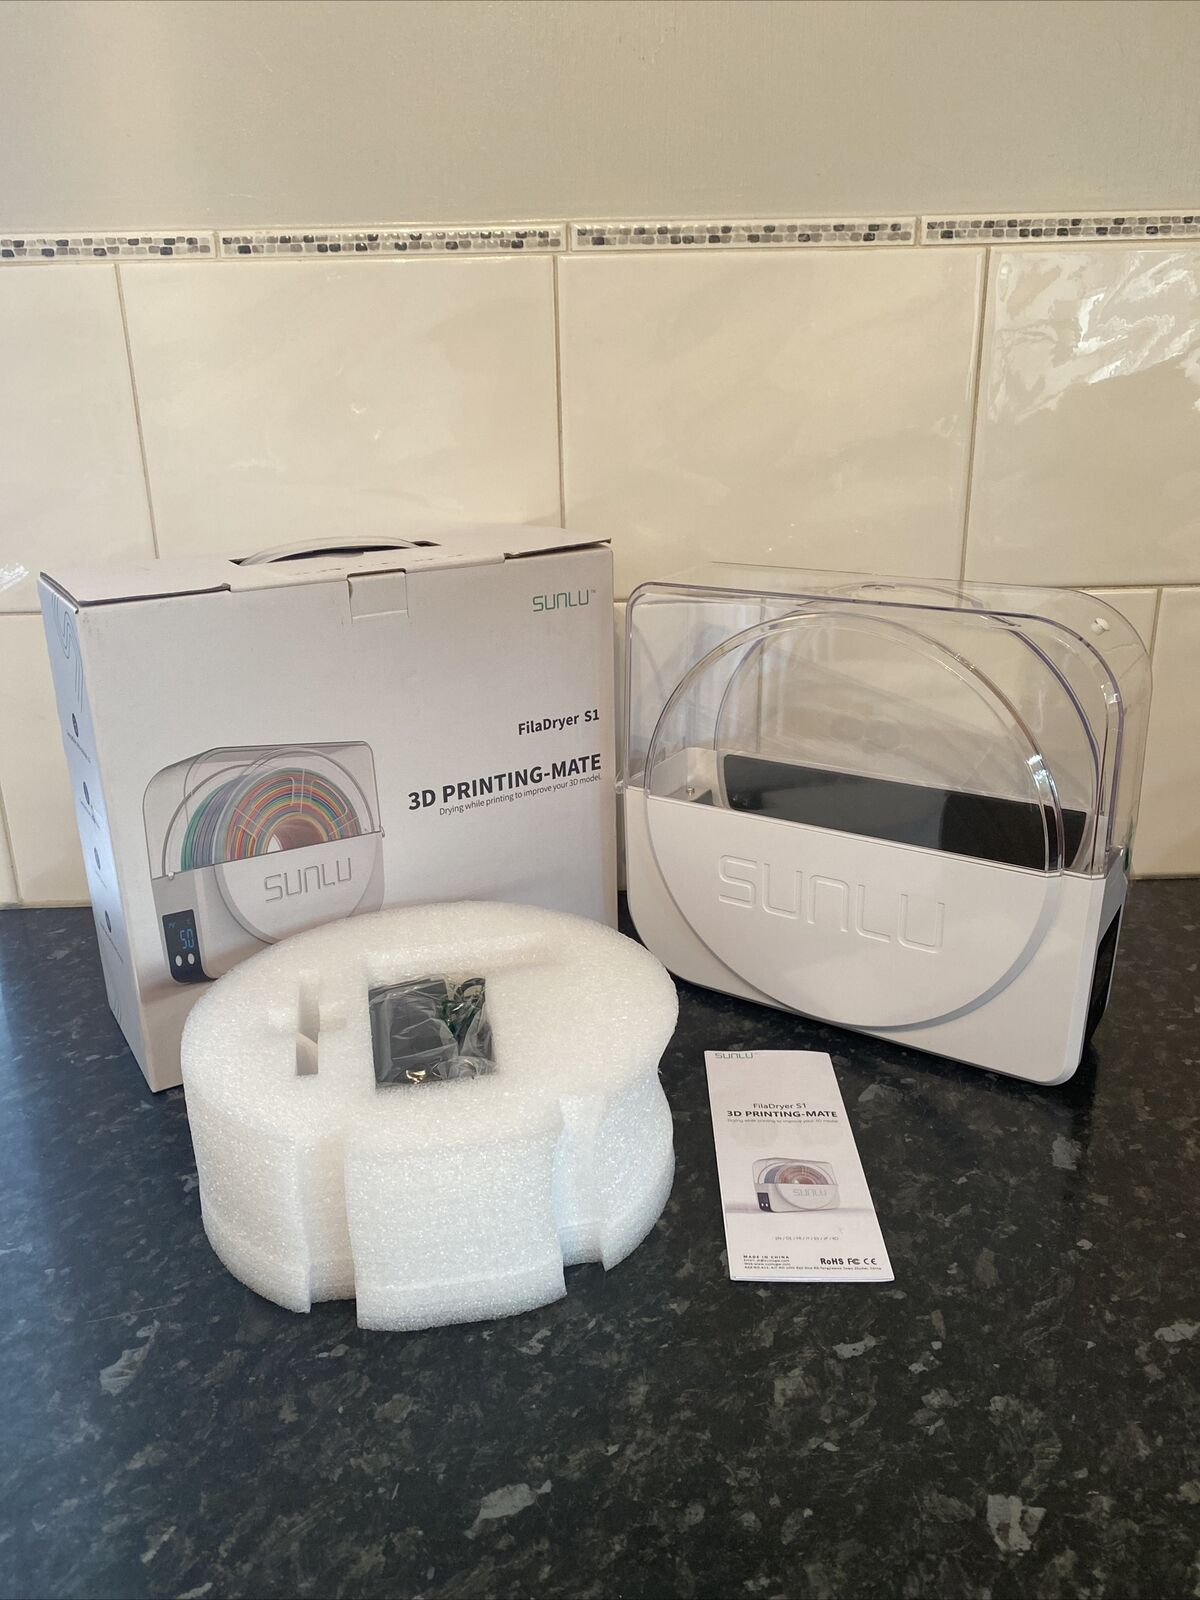 SUNLU FilaDryer S1 3D Printing Mate Drying While Printing New Boxed UK Plug